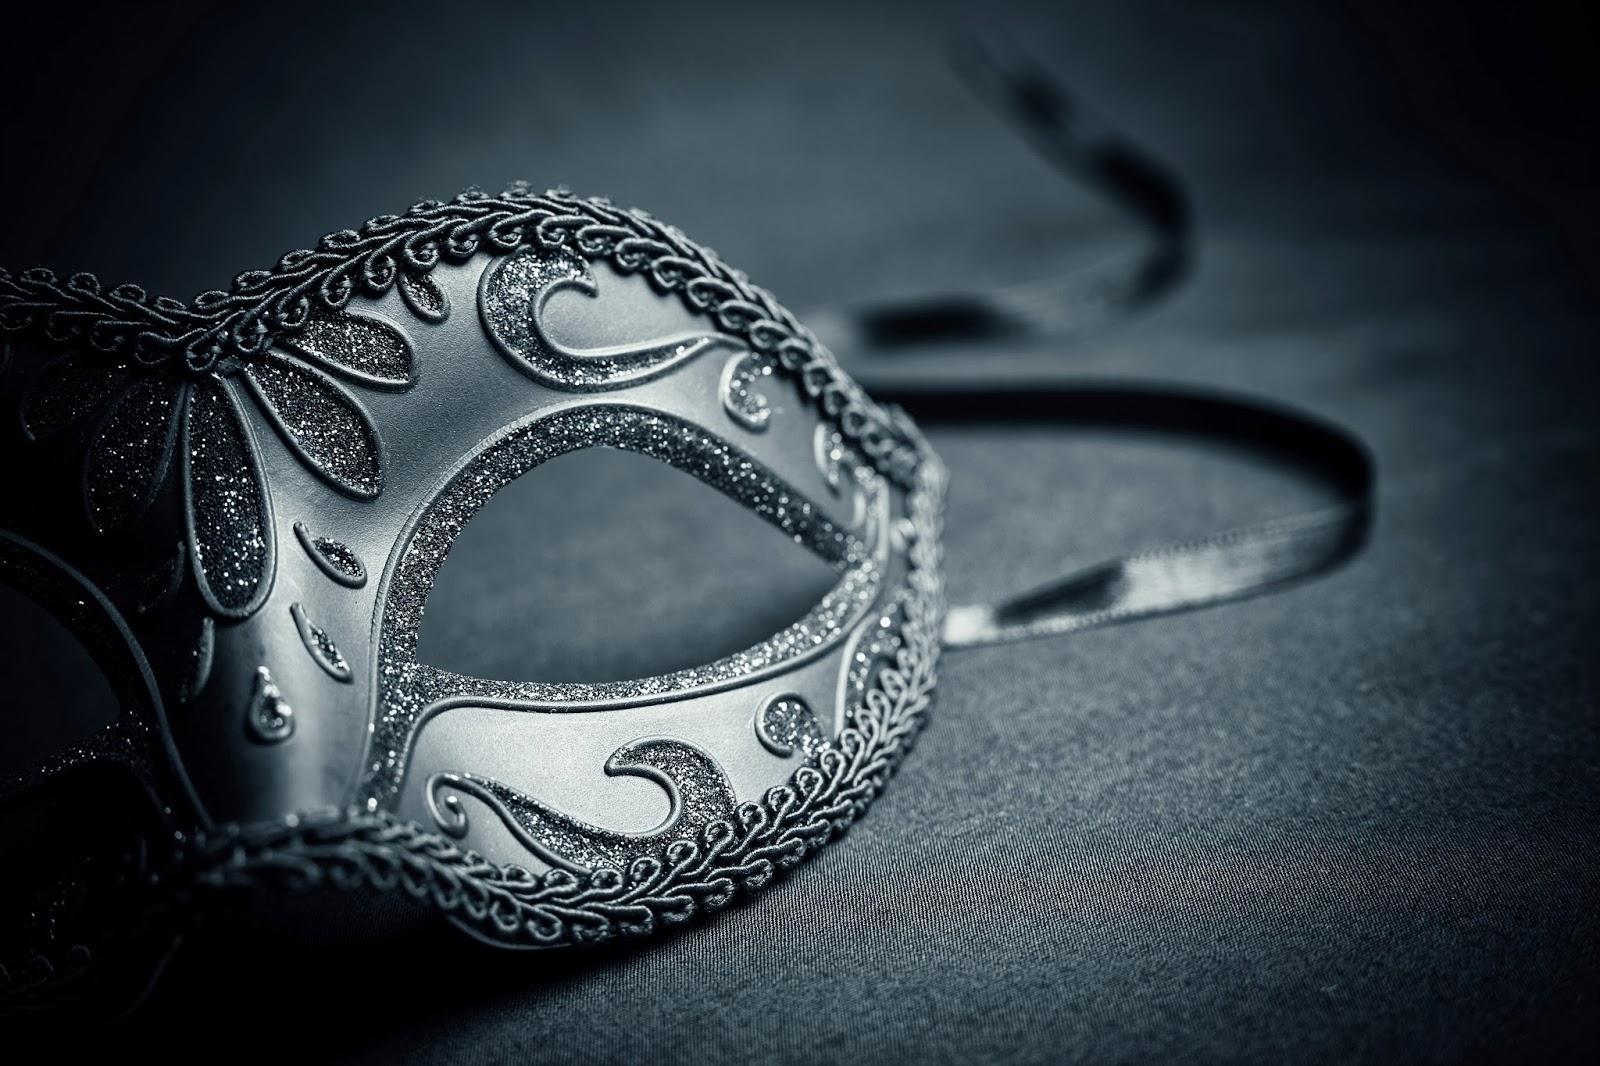 masquerade mask black background wallpaper - photo #5